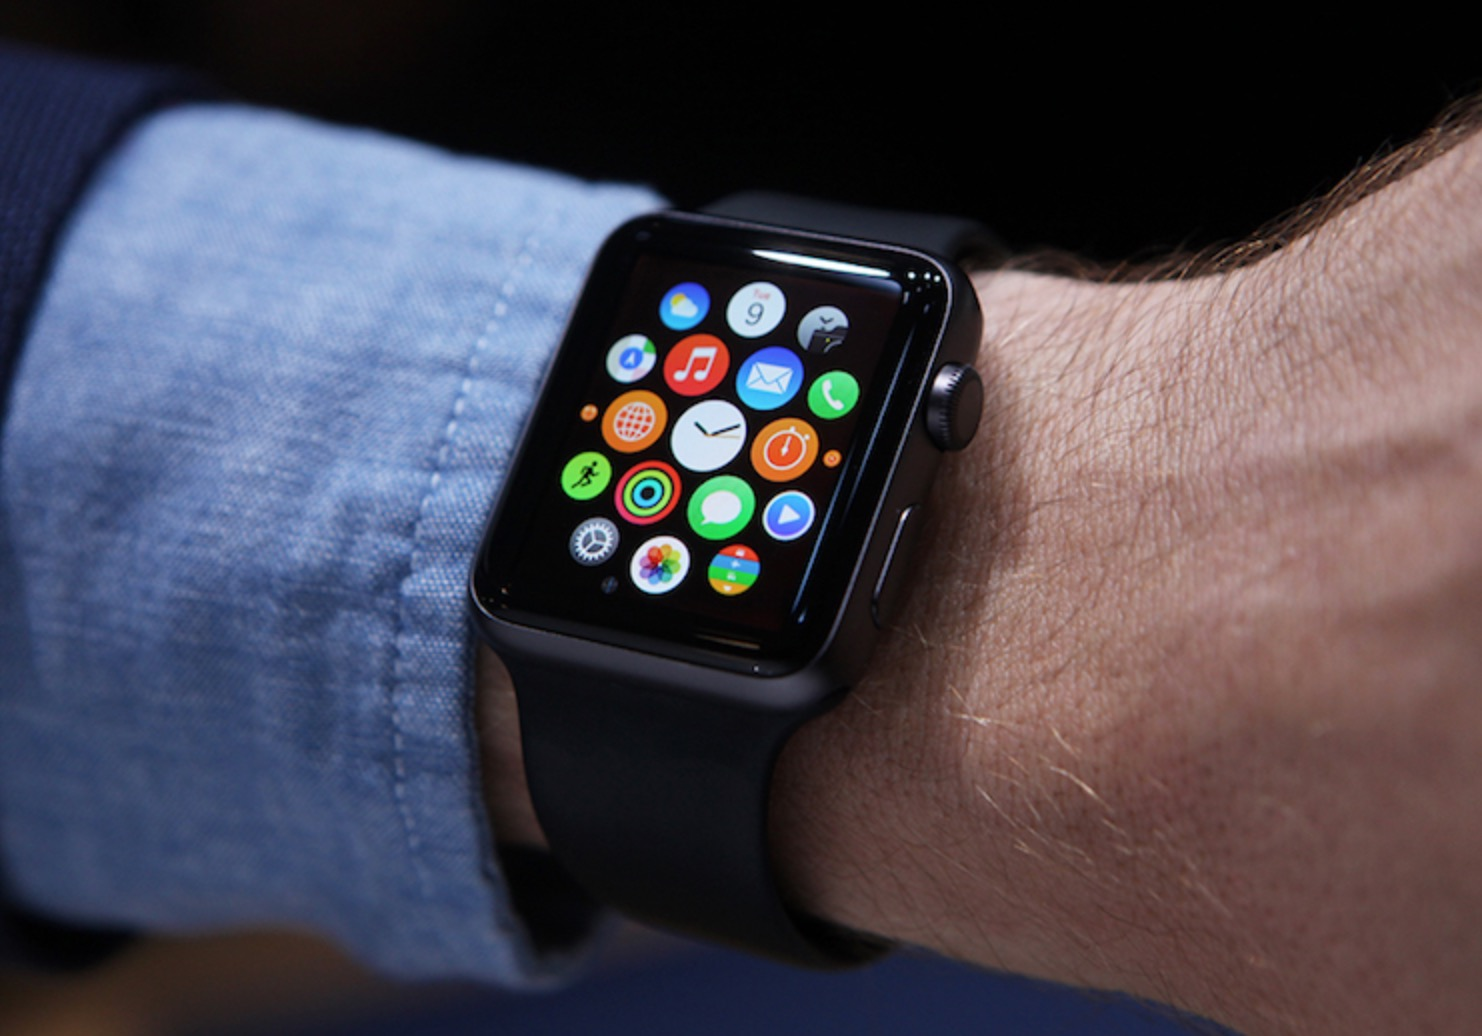 Apple Watch 2 smartwatch